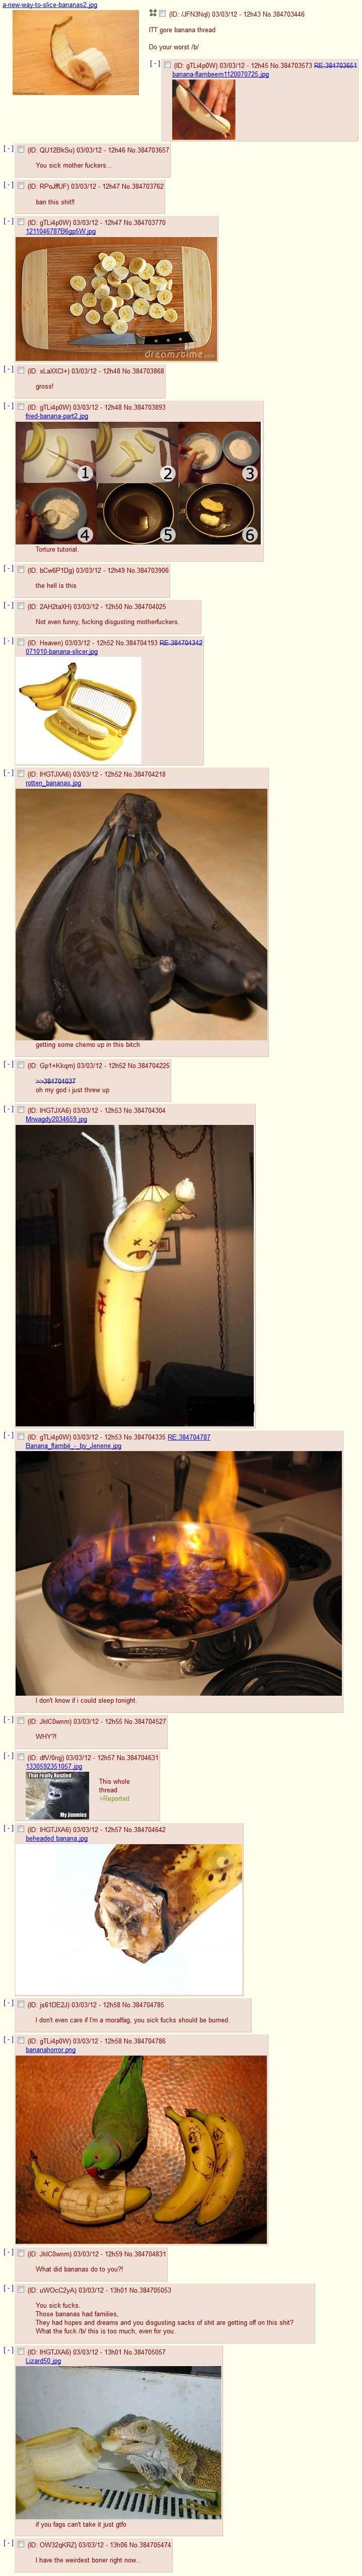 banana-gore thread. bana- gore thread. D an // 03/ No 304703446 W gore banana thread Do your wens! /07 H D an ) 03703/ 12 - 12045 No 304703573 wmm H D an ) 0370